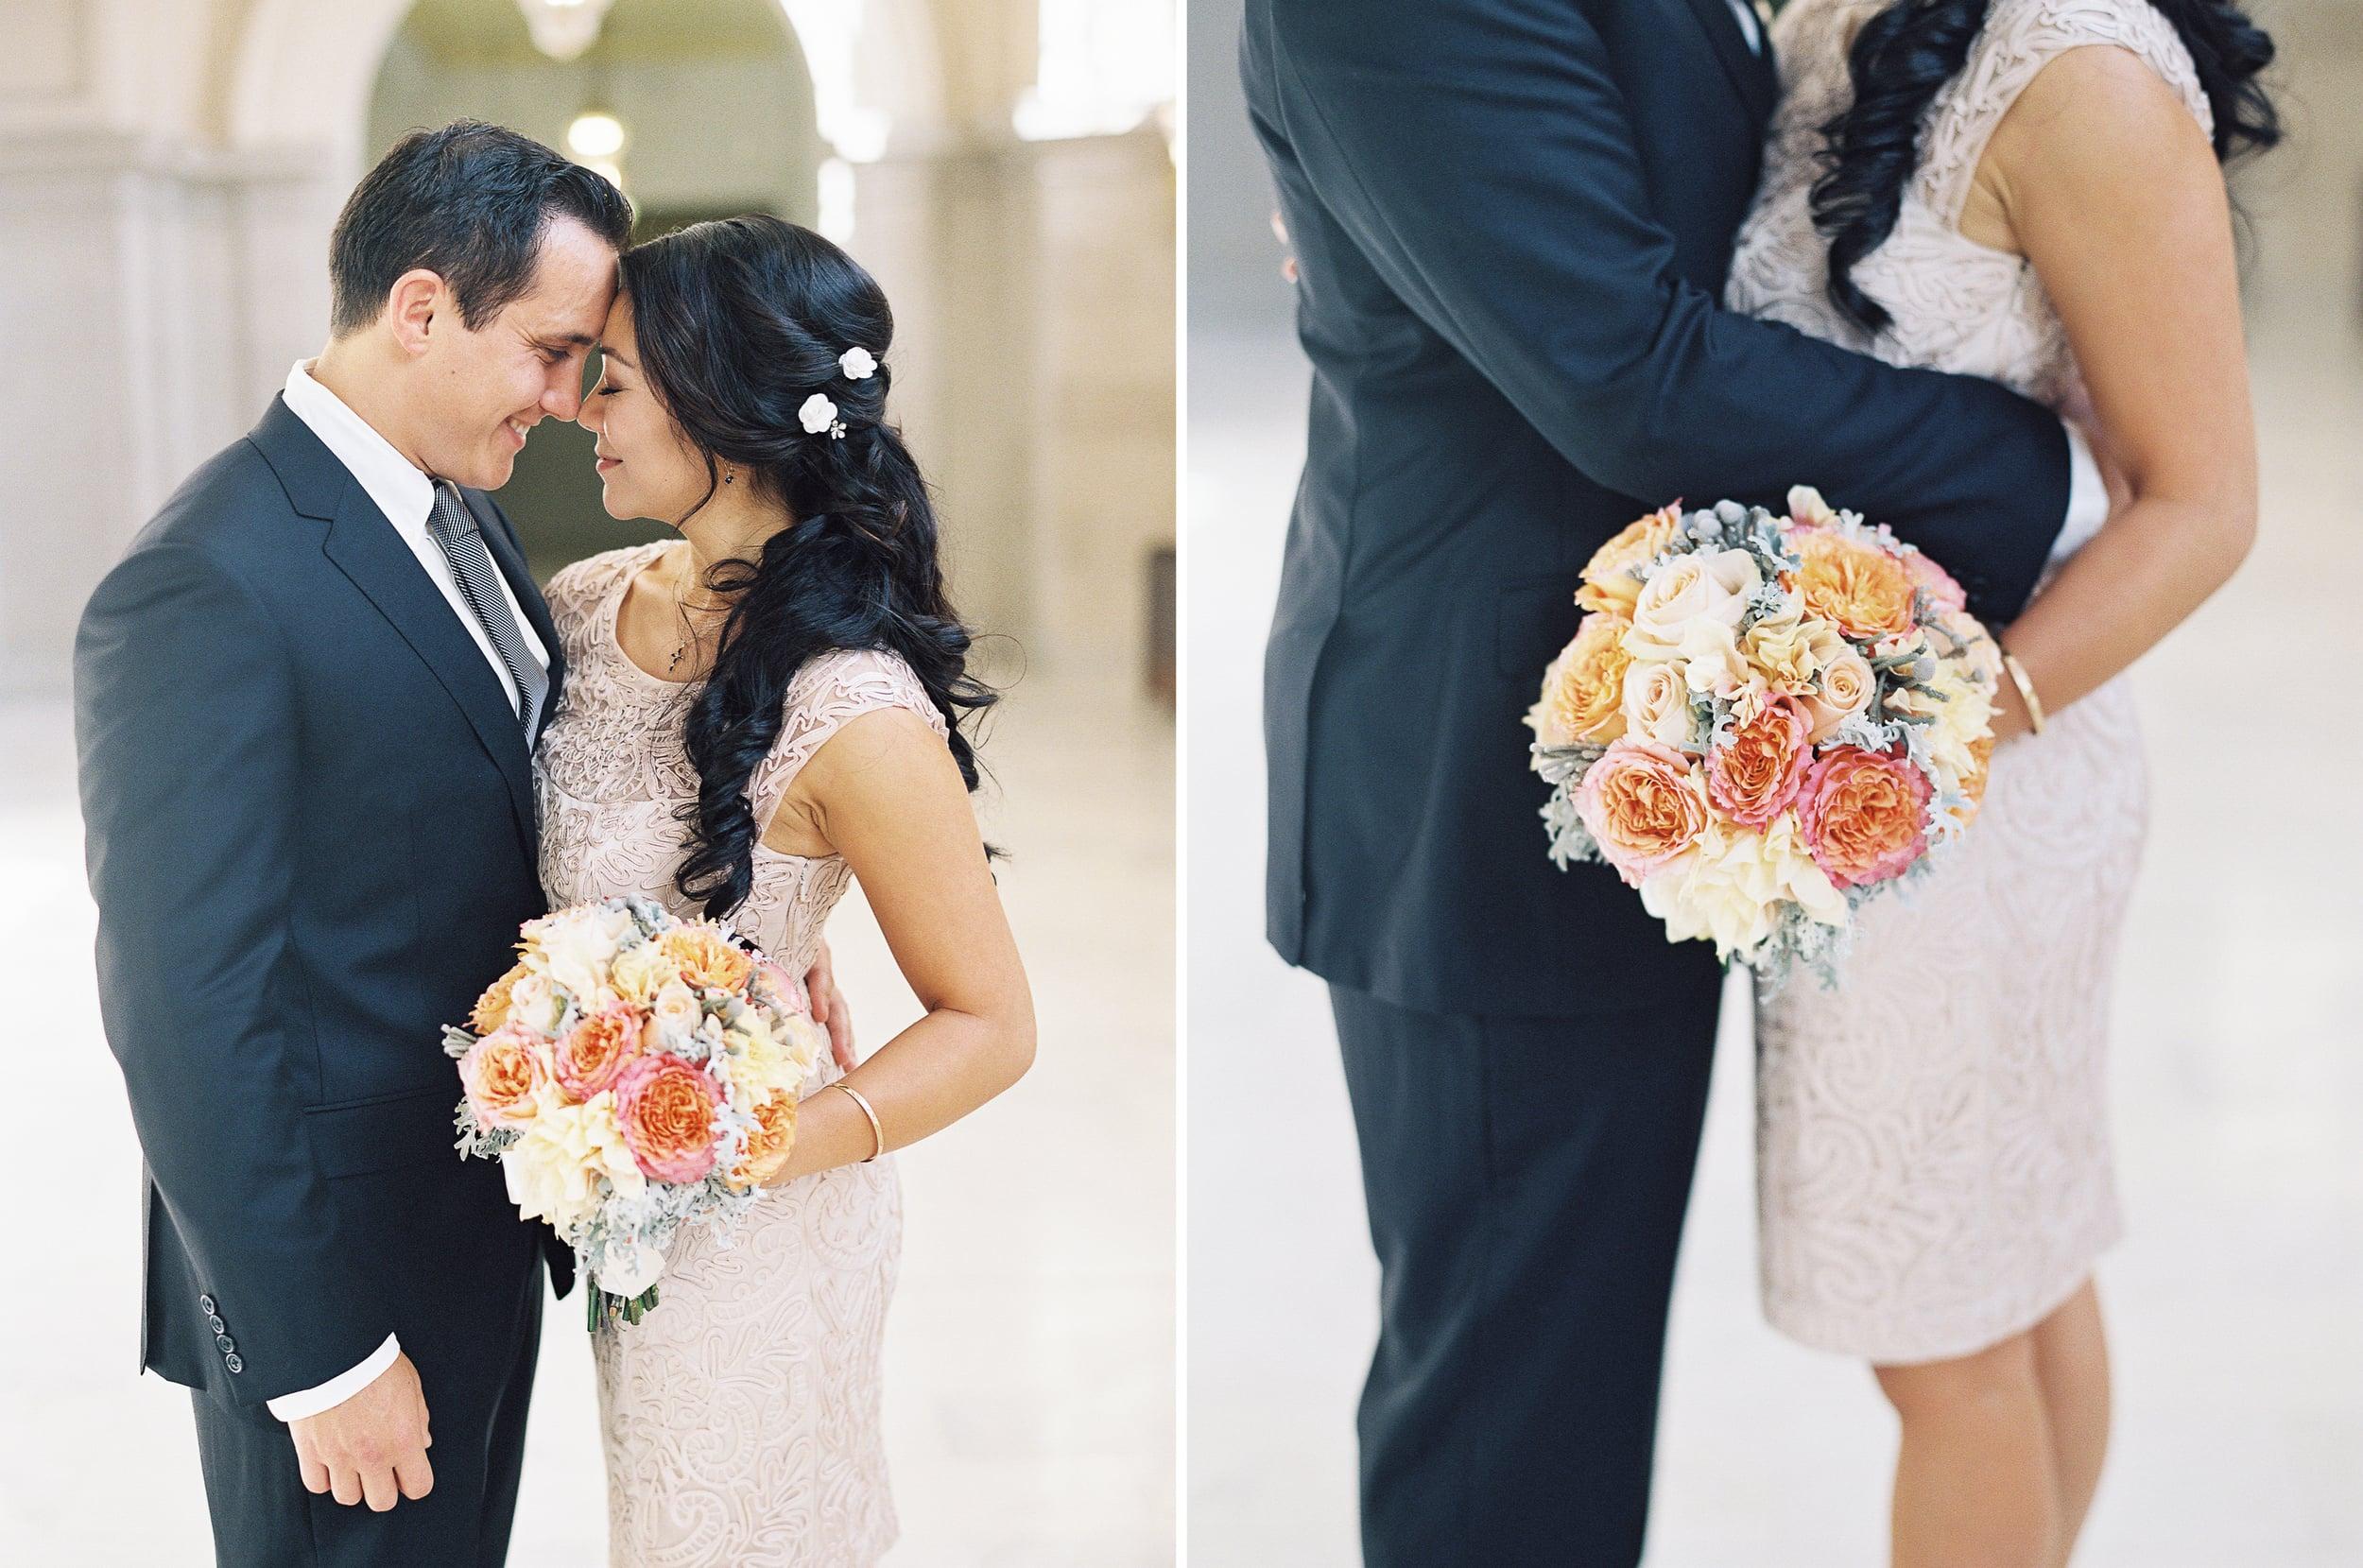 Meghan Mehan Photography - Fine Art Film Wedding Photography - California   San Francisco   Napa   Sonoma   Carmel   Big Sur   Nashville   Tennessee - 053.jpg